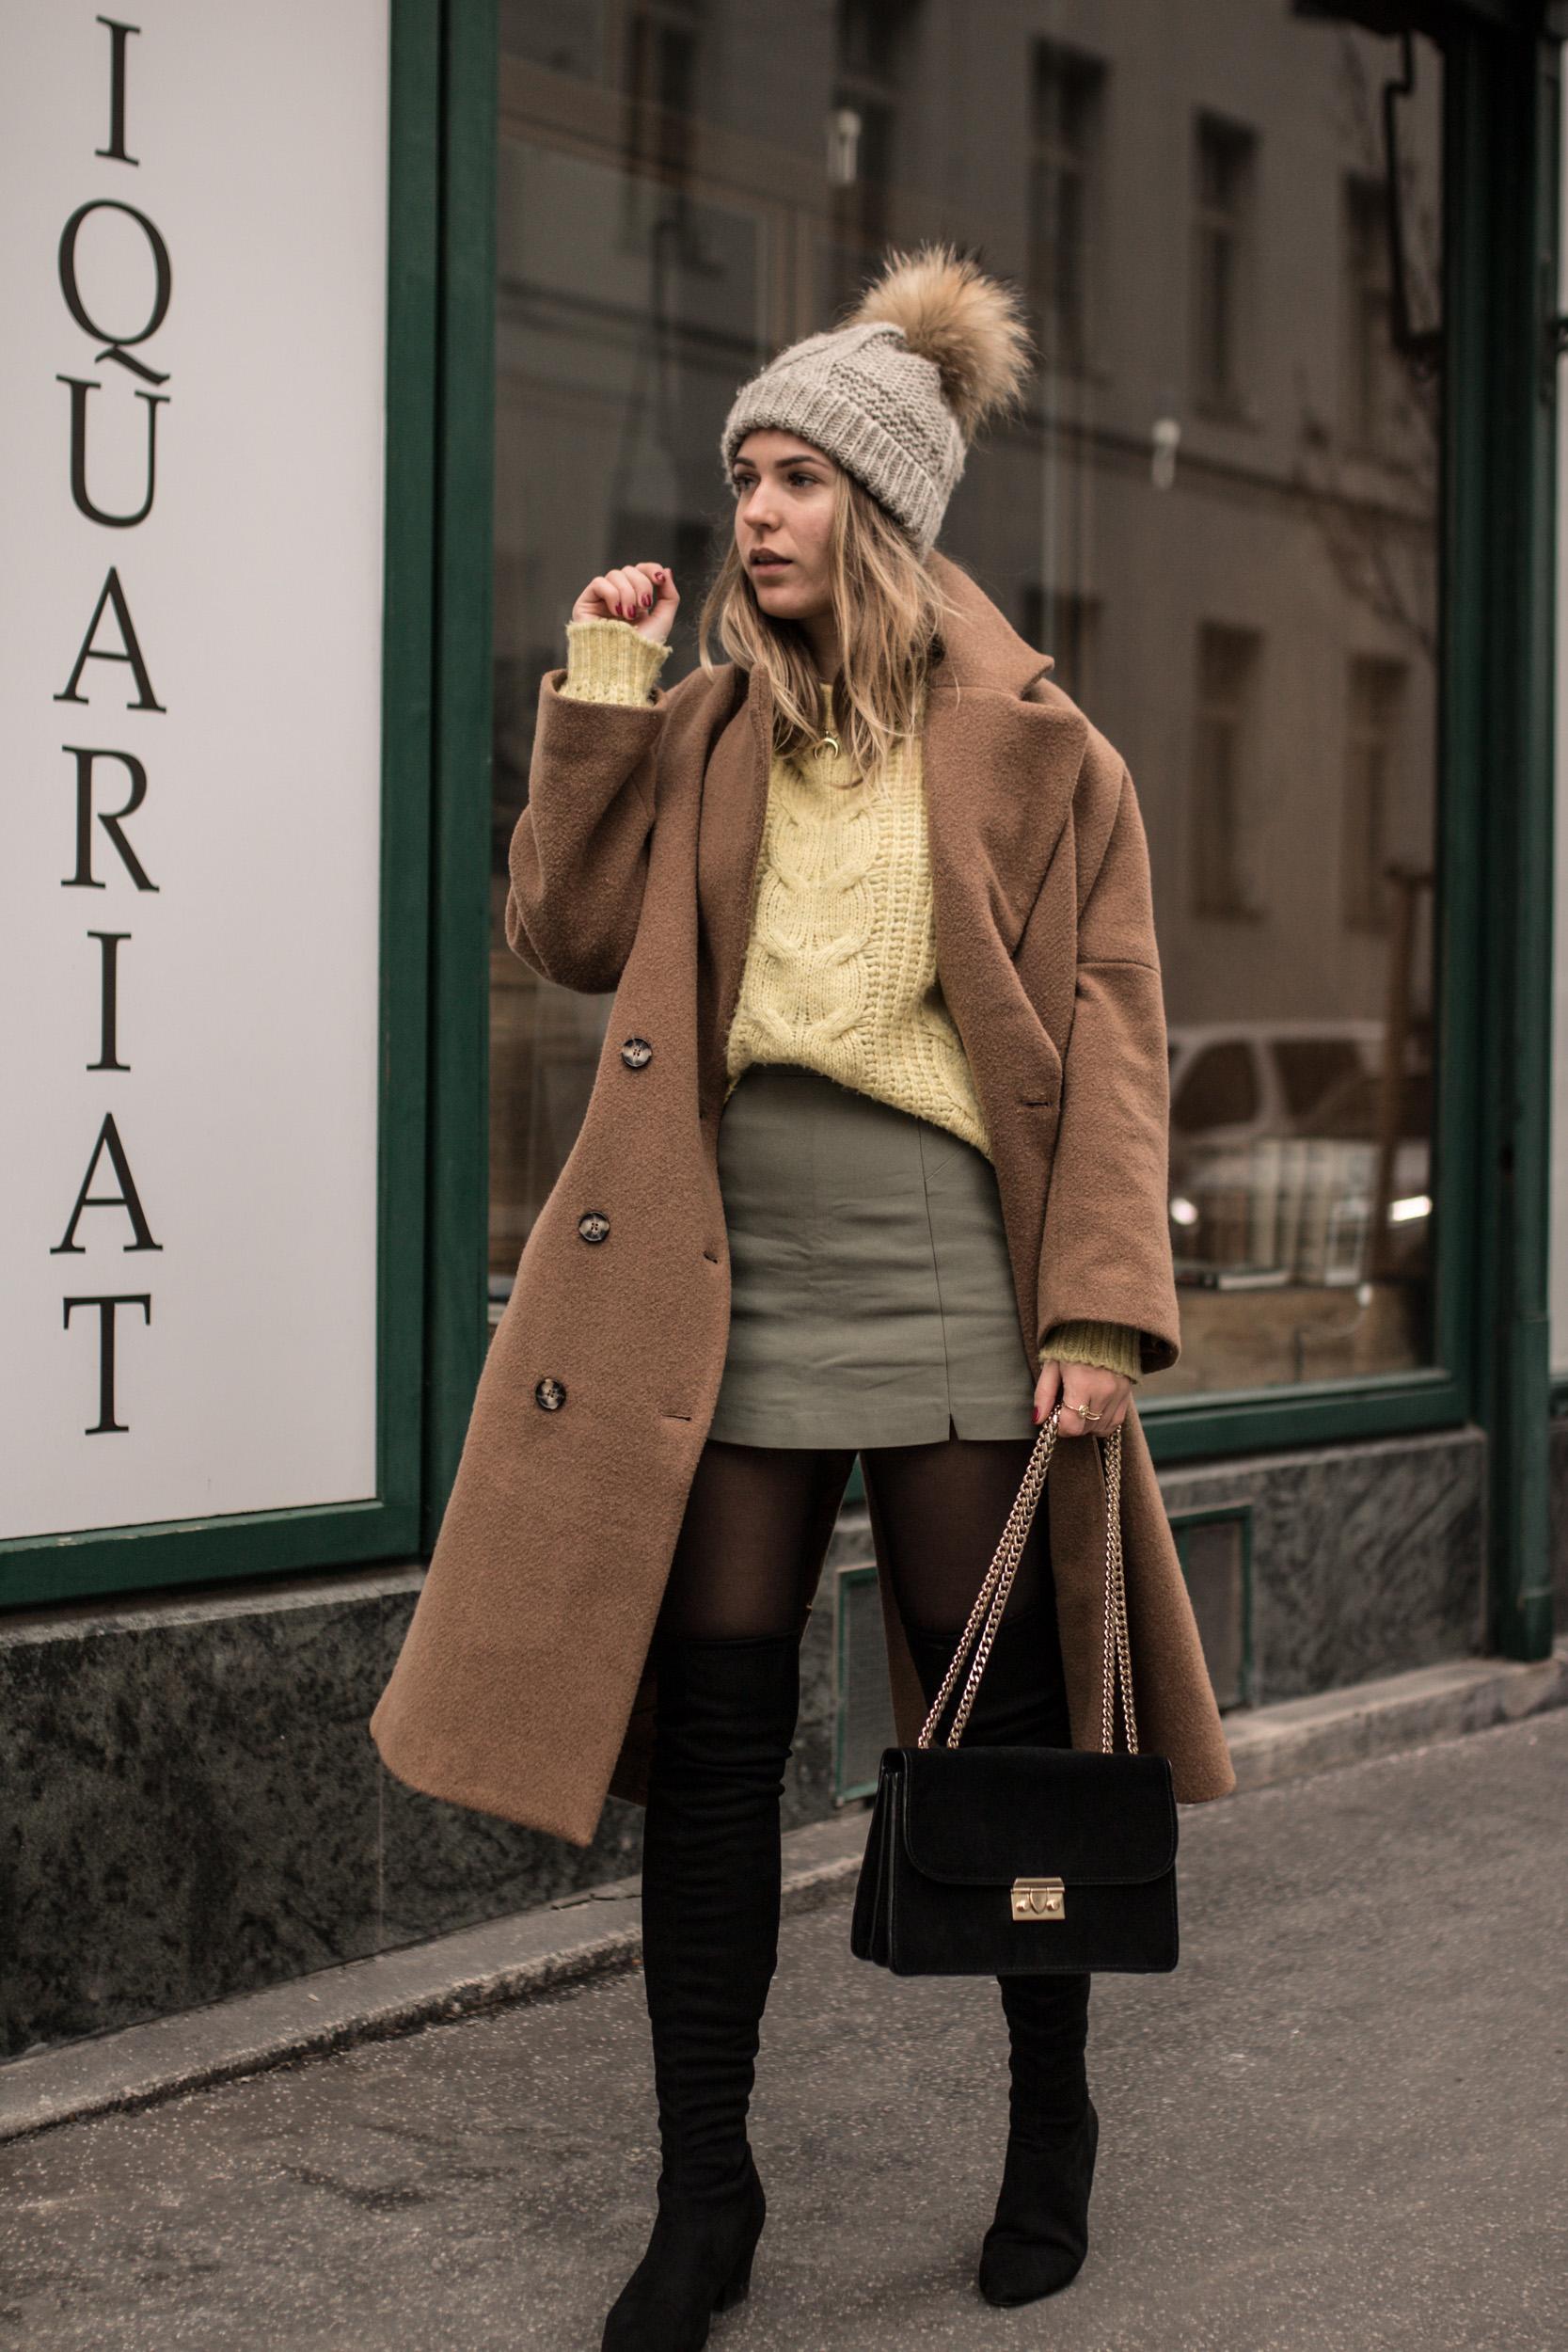 Blog Your Style: Hauben